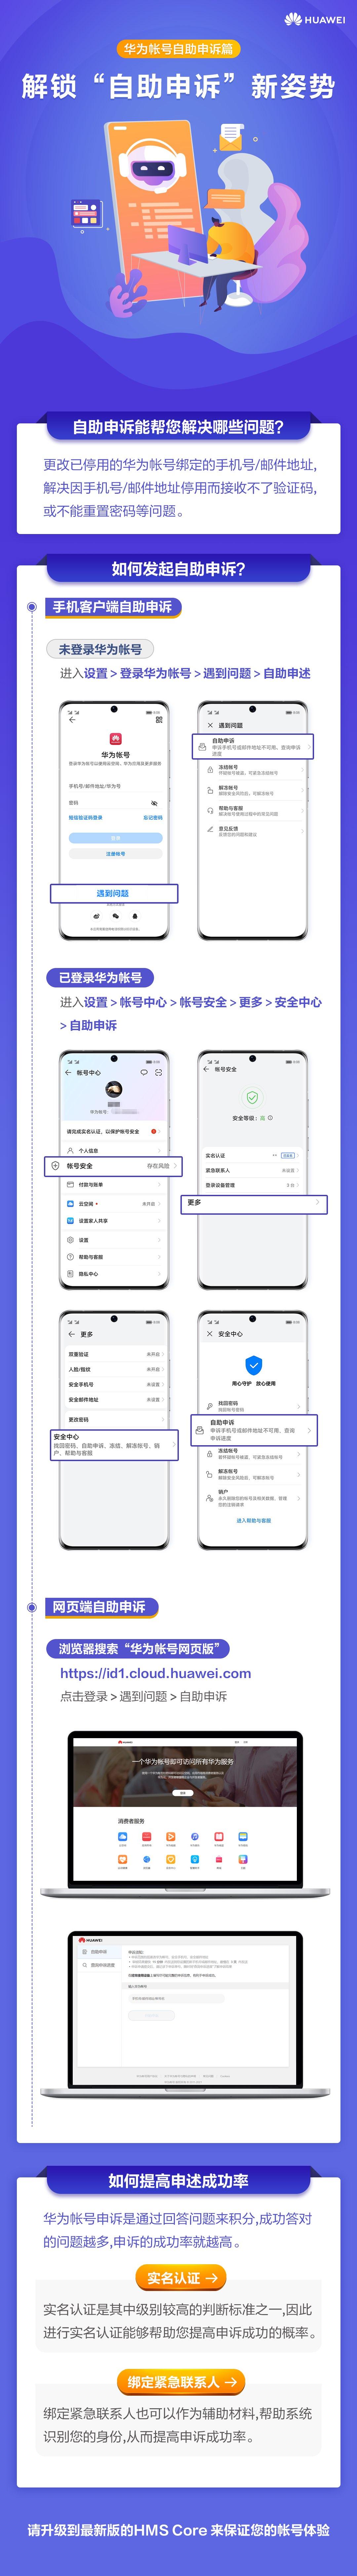 P50 手机框的 自助申诉长图.jpg